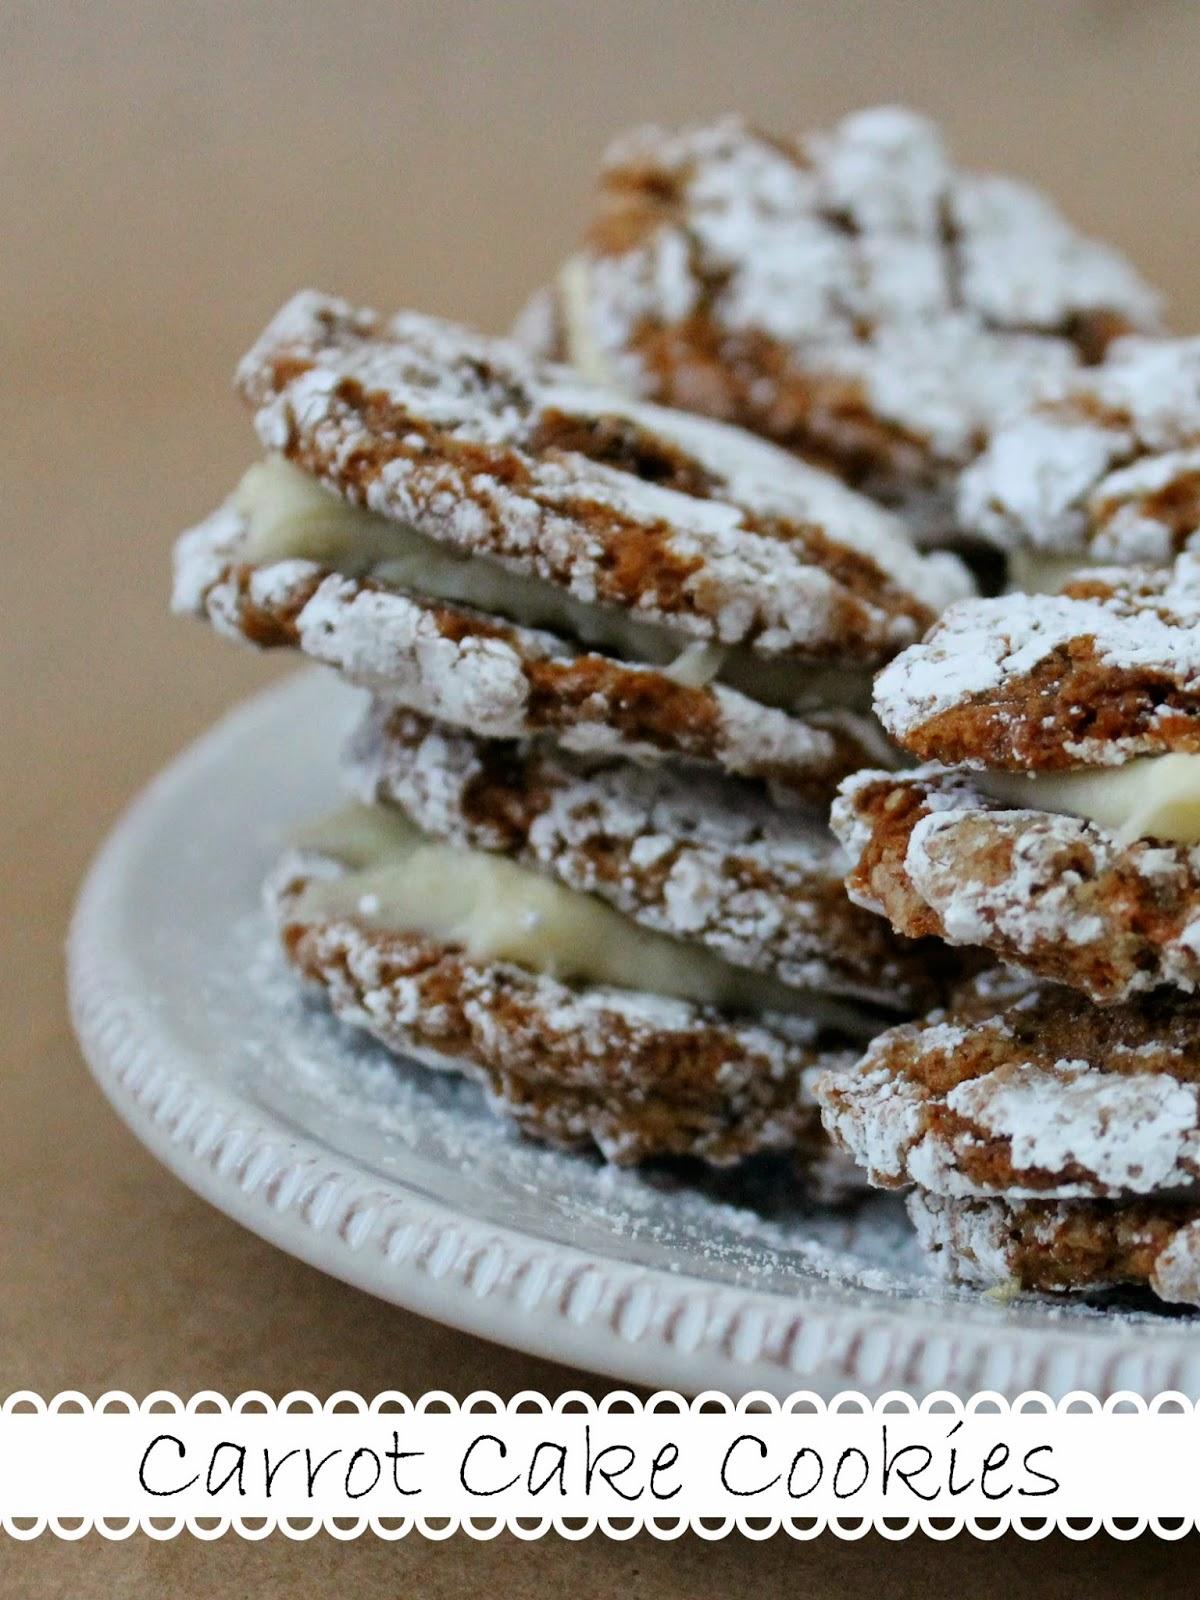 http://wonderfullymadebyleslie.blogspot.com/2014/04/carrot-cake-cookies.html